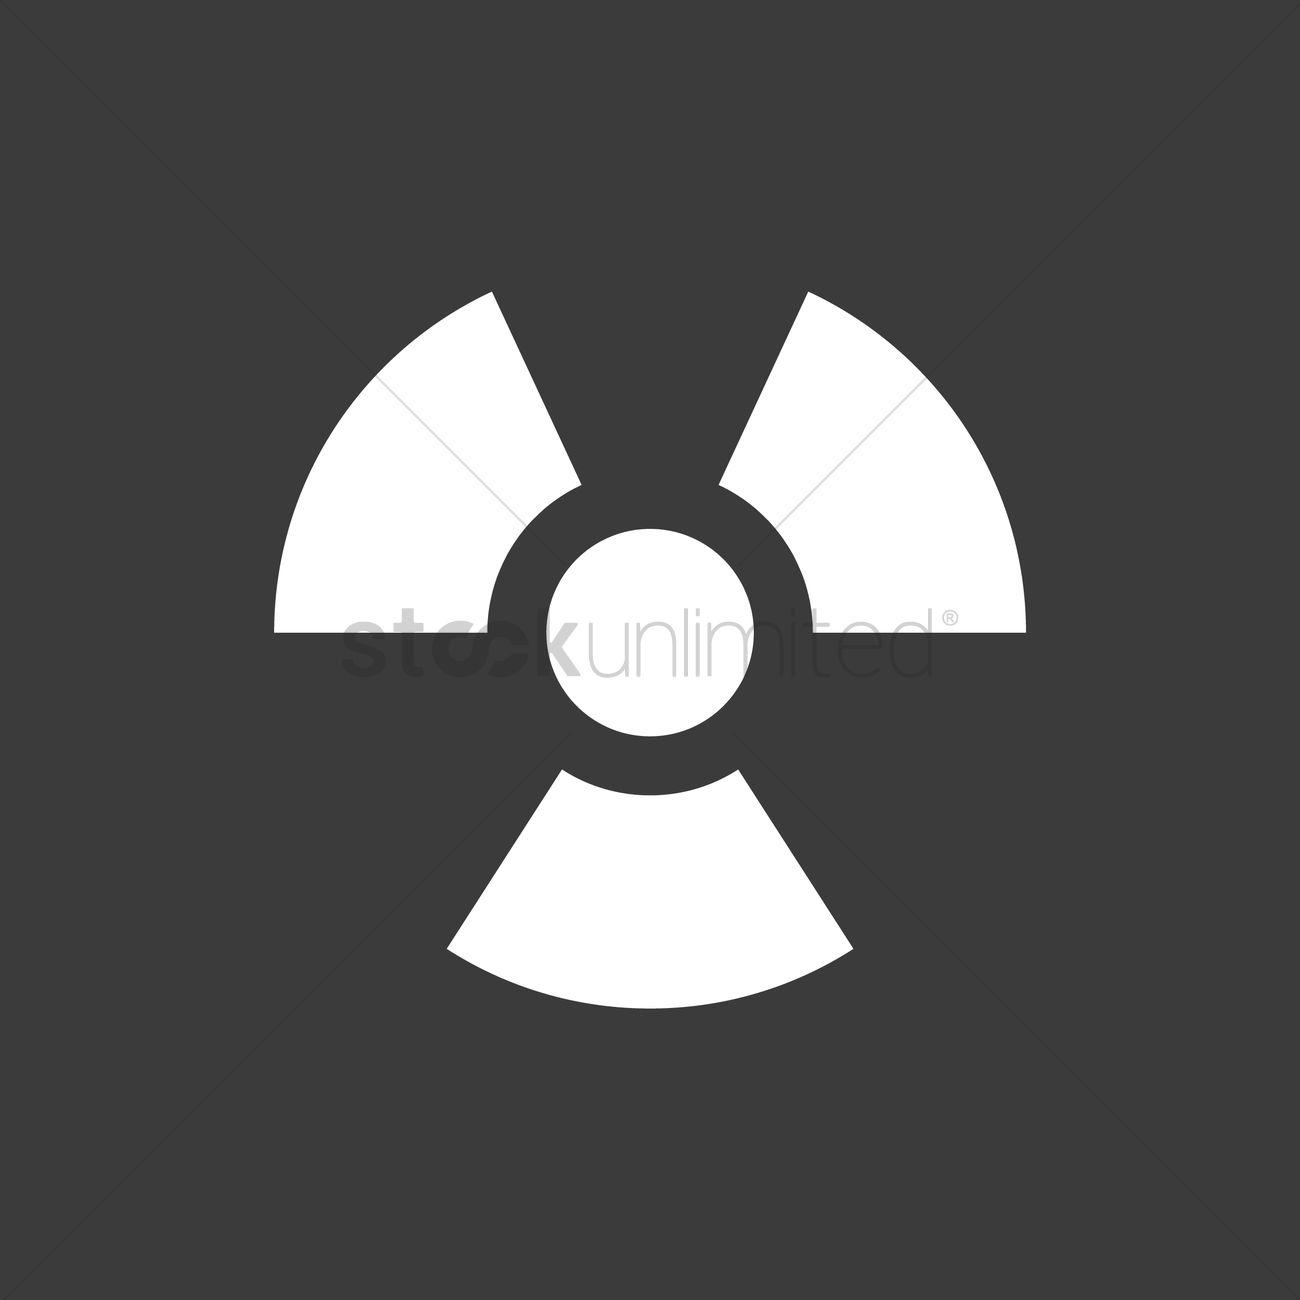 Radioactive symbol vector image 2029548 stockunlimited radioactive symbol vector graphic buycottarizona